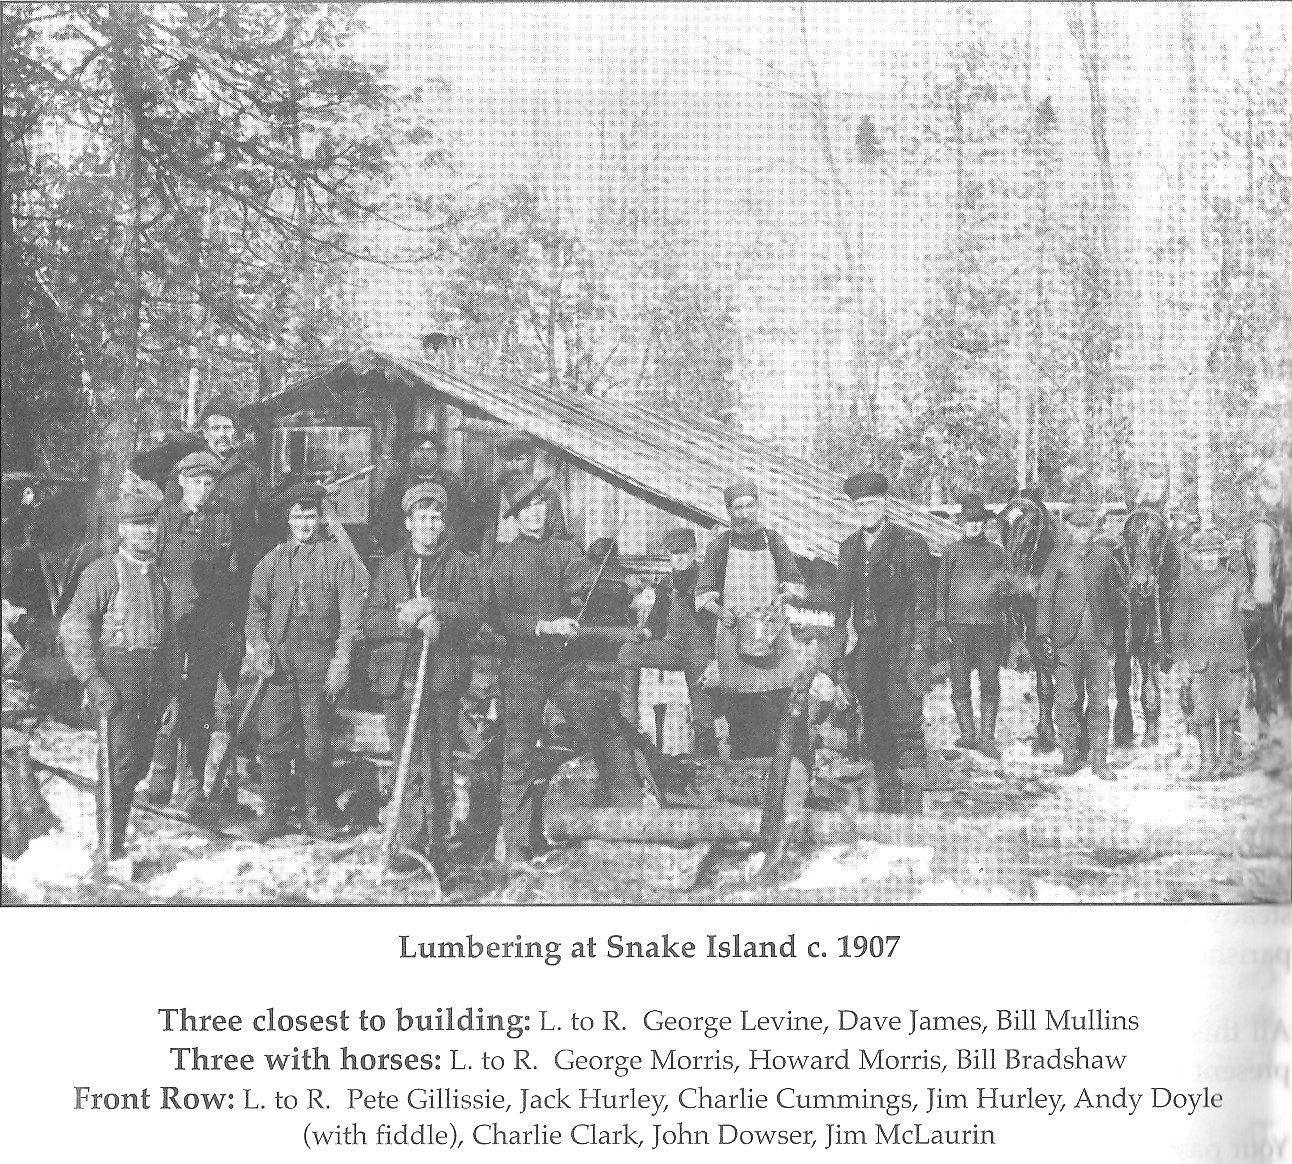 Snake Island Lumbering Shanty, 1907, Osgoode Township, Ontario, Canada